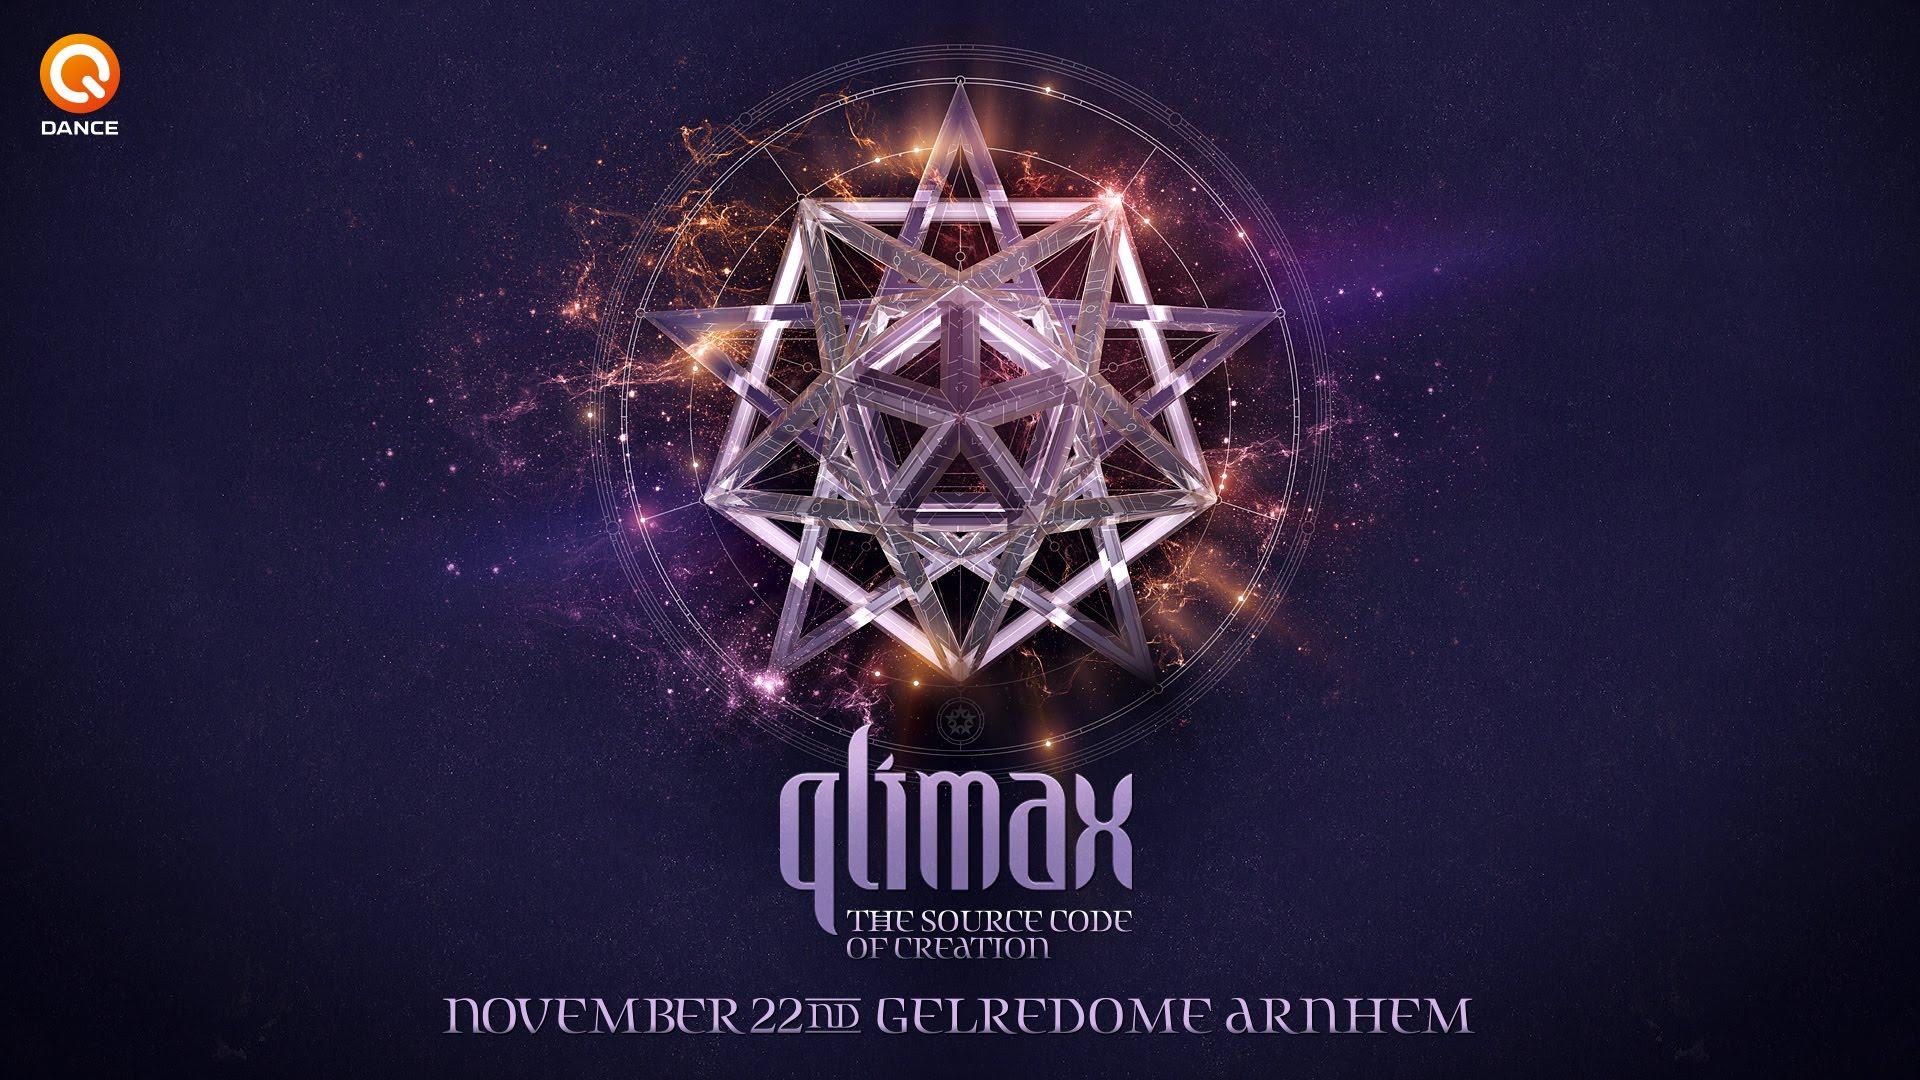 Qlimax 2014 Poster5